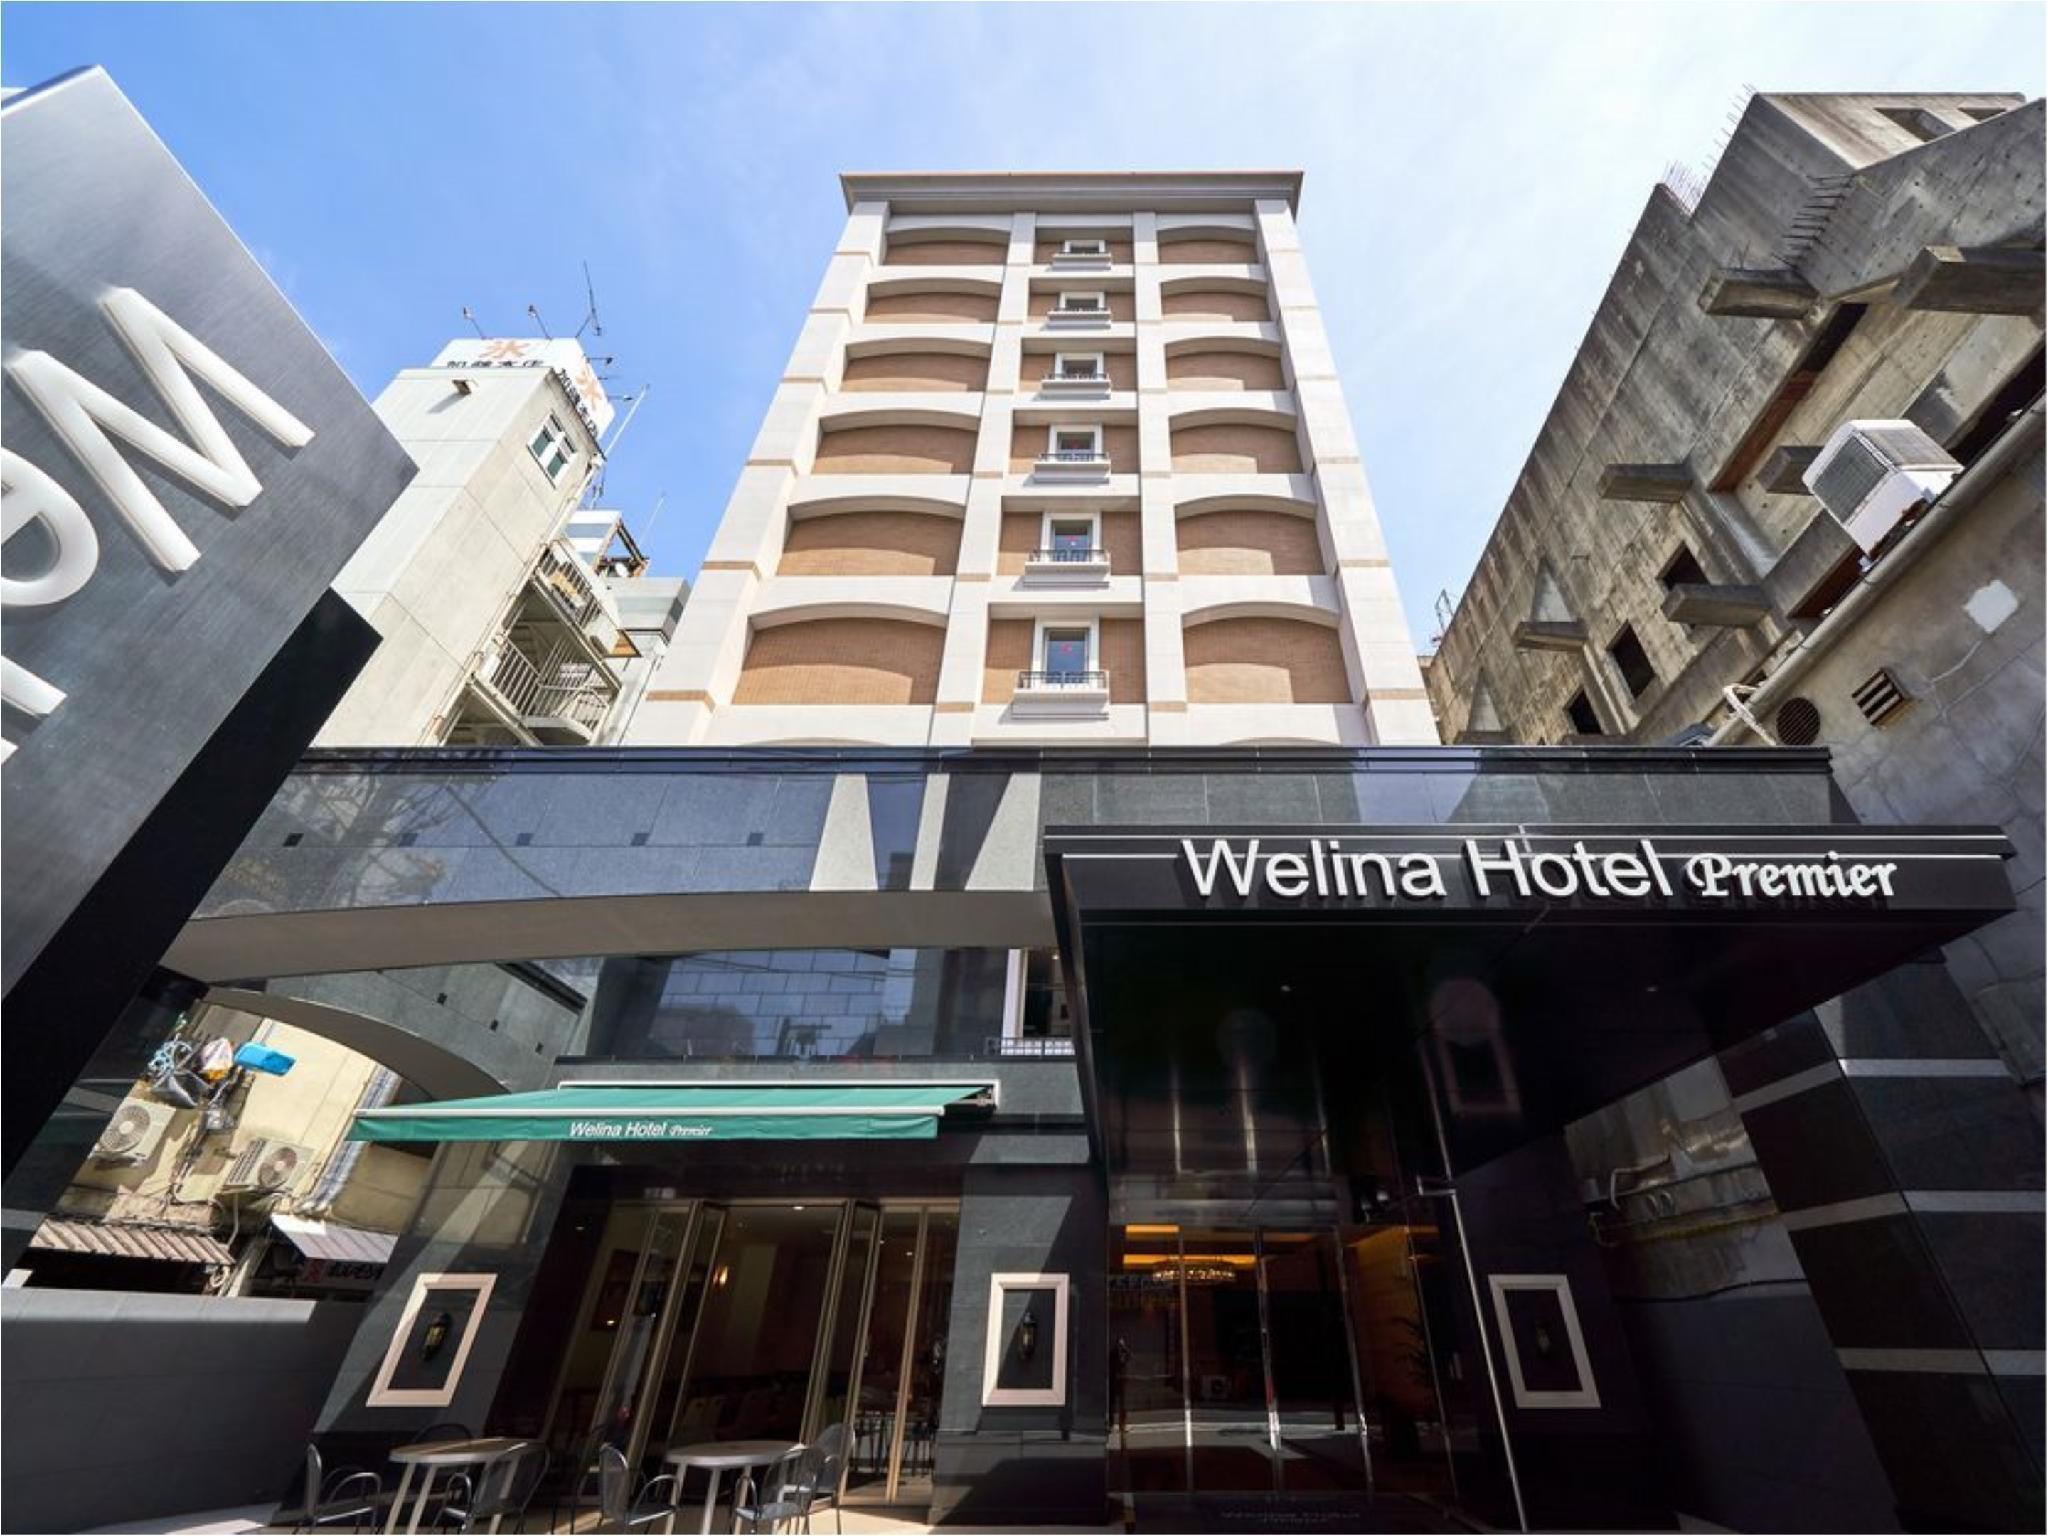 Welina Hotel Premier Shinsaibashi